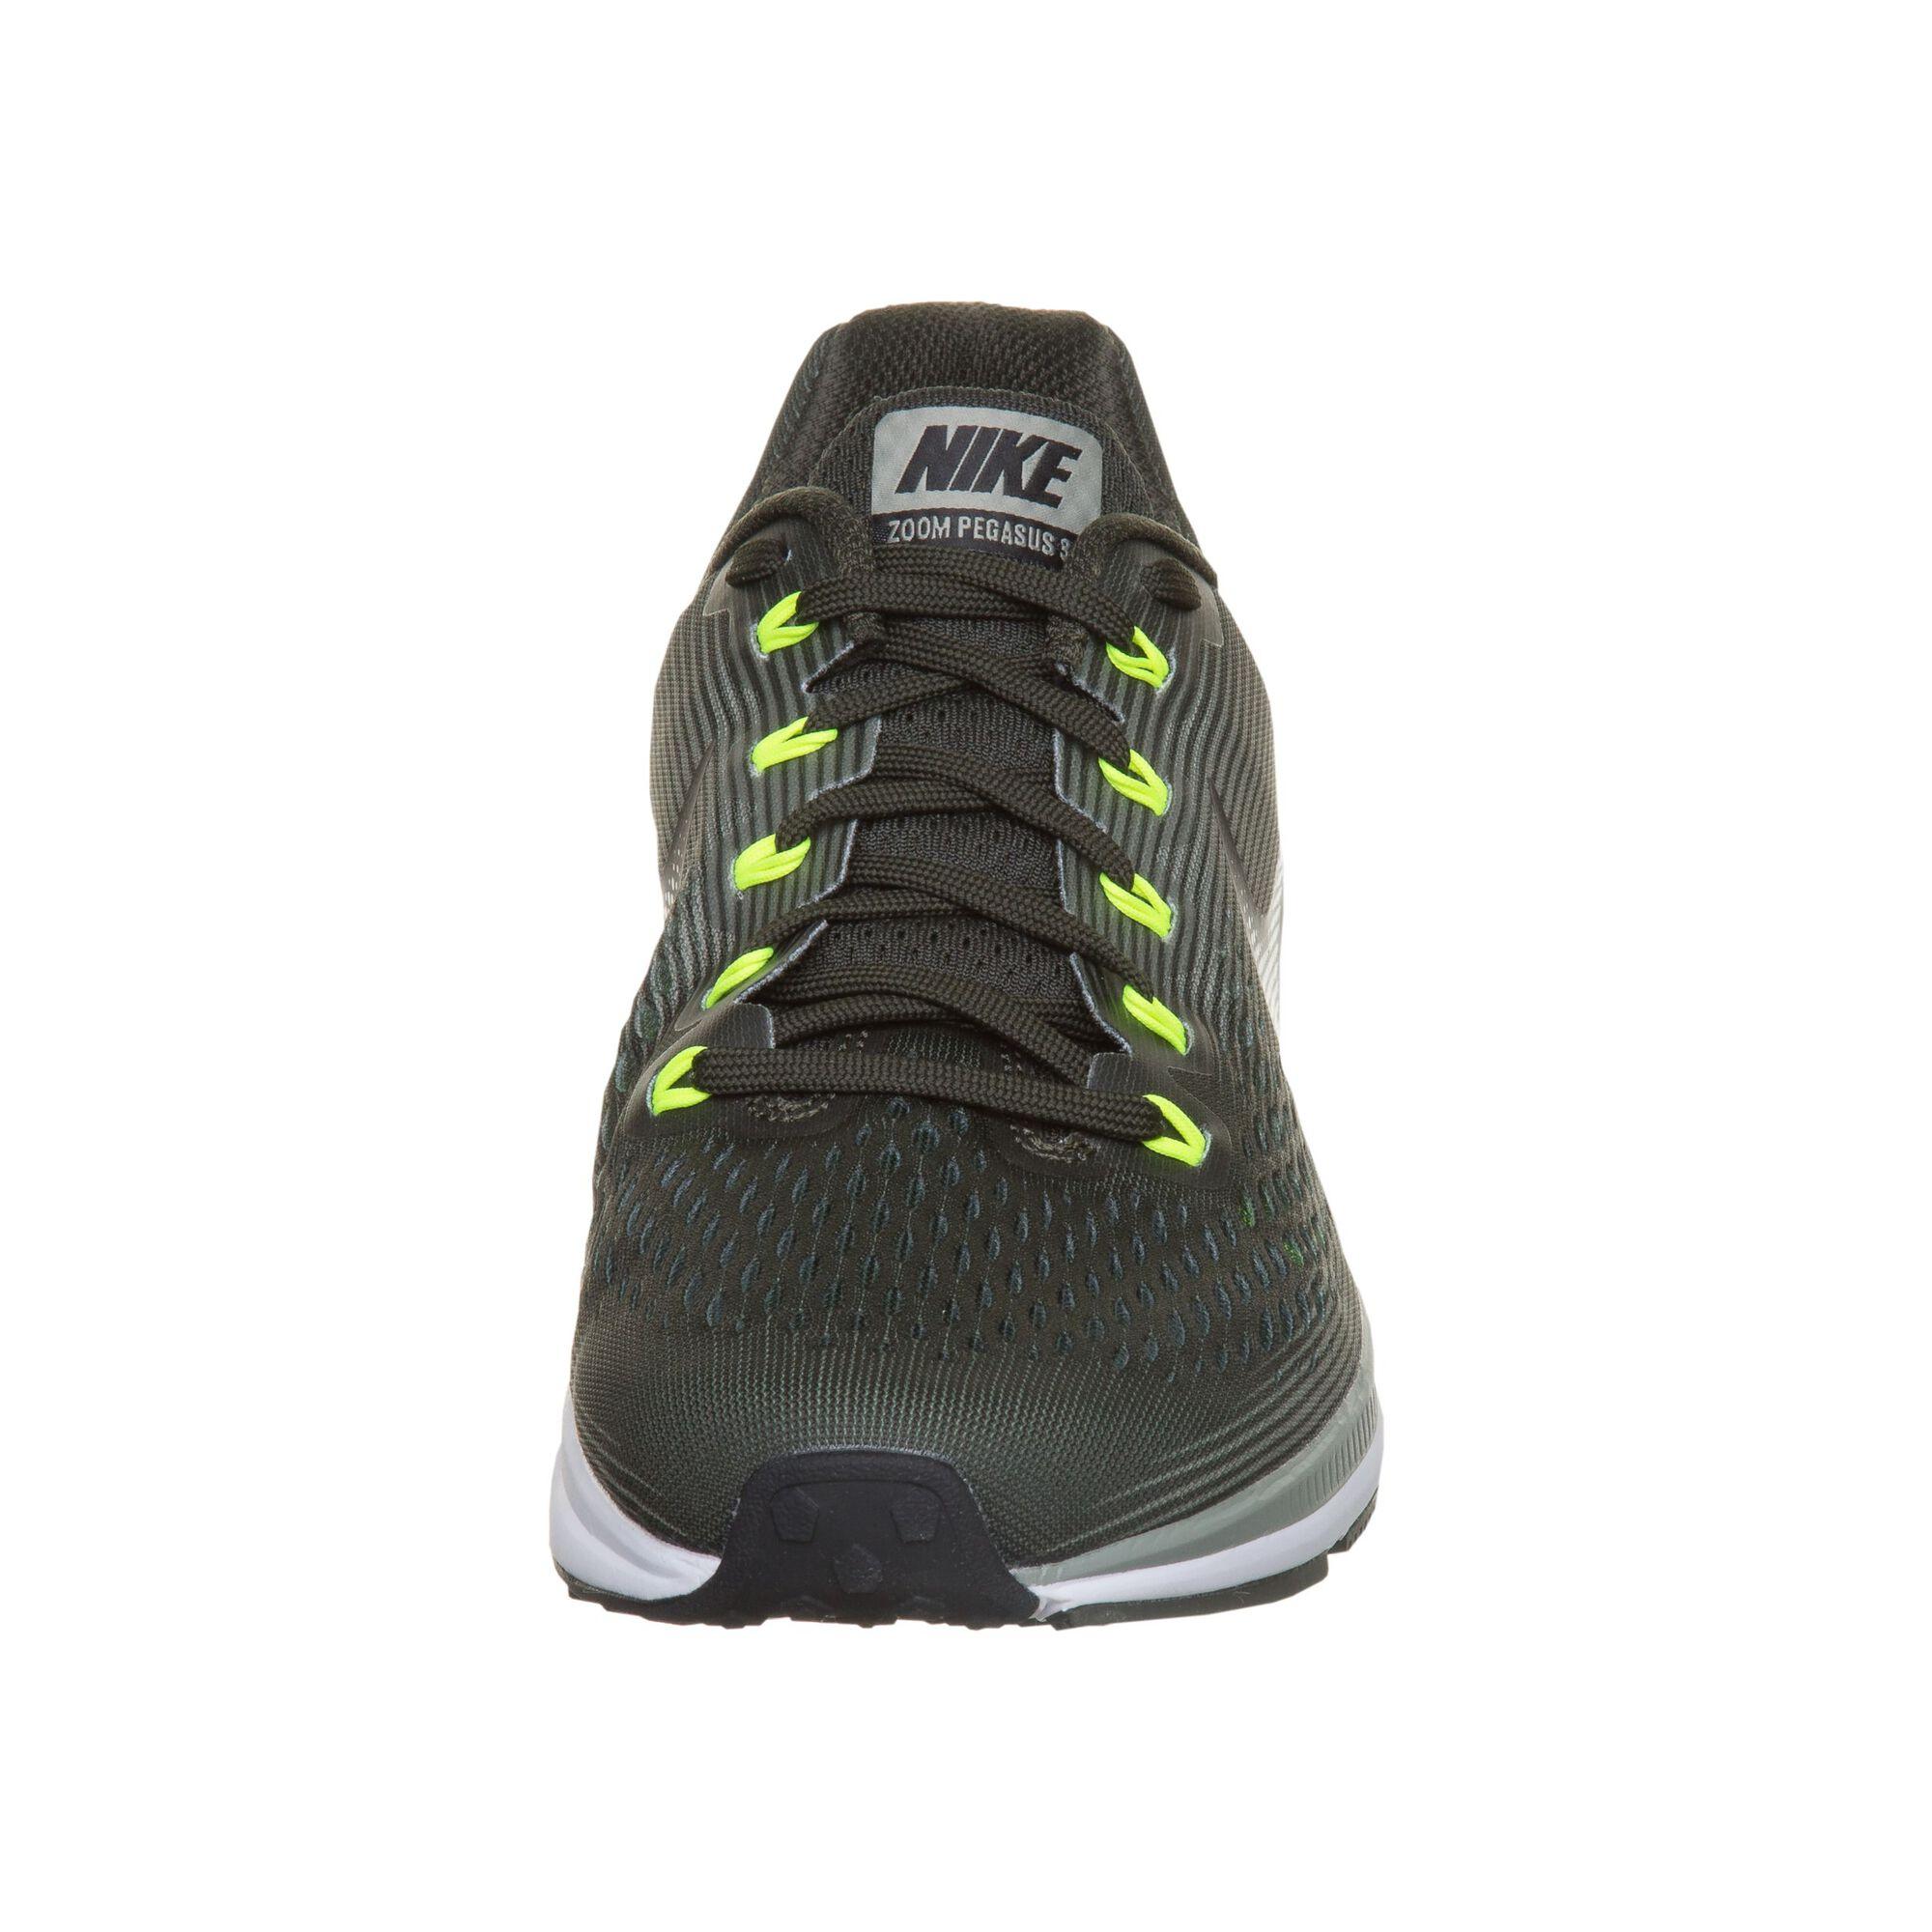 90534c6add58 buy Nike Air Zoom Pegasus 34 Neutral Running Shoe Men - Olive